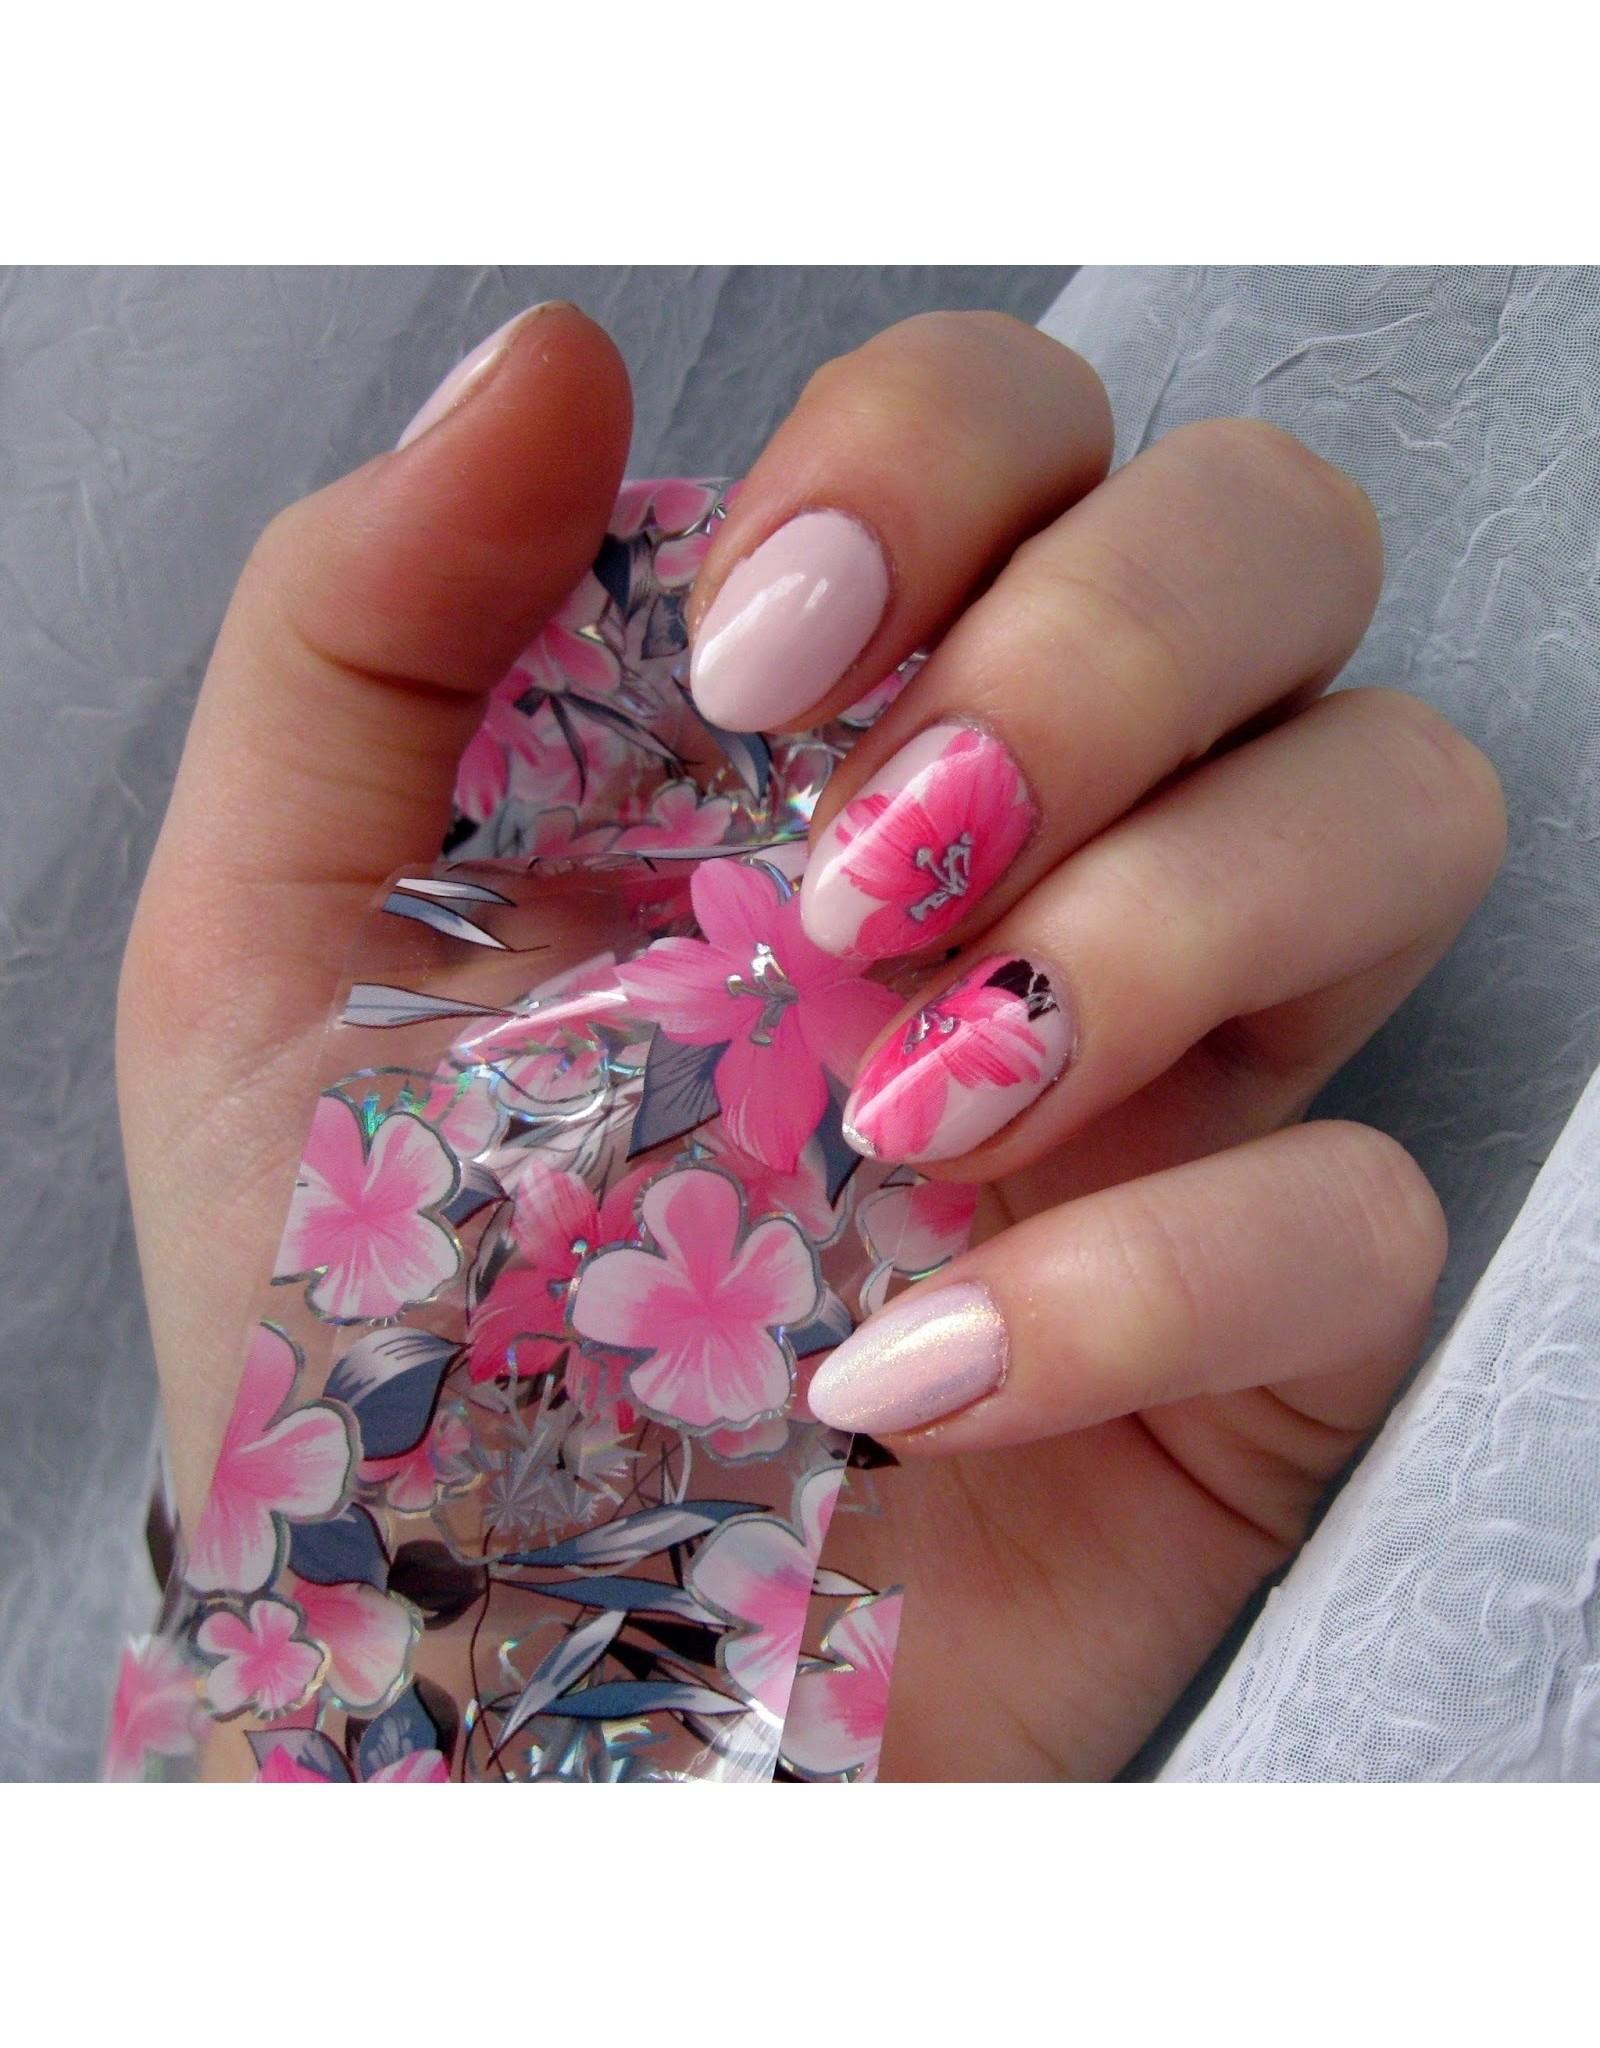 Merkloos Nagel transfer folie nail art set (03) Animal and fantasy